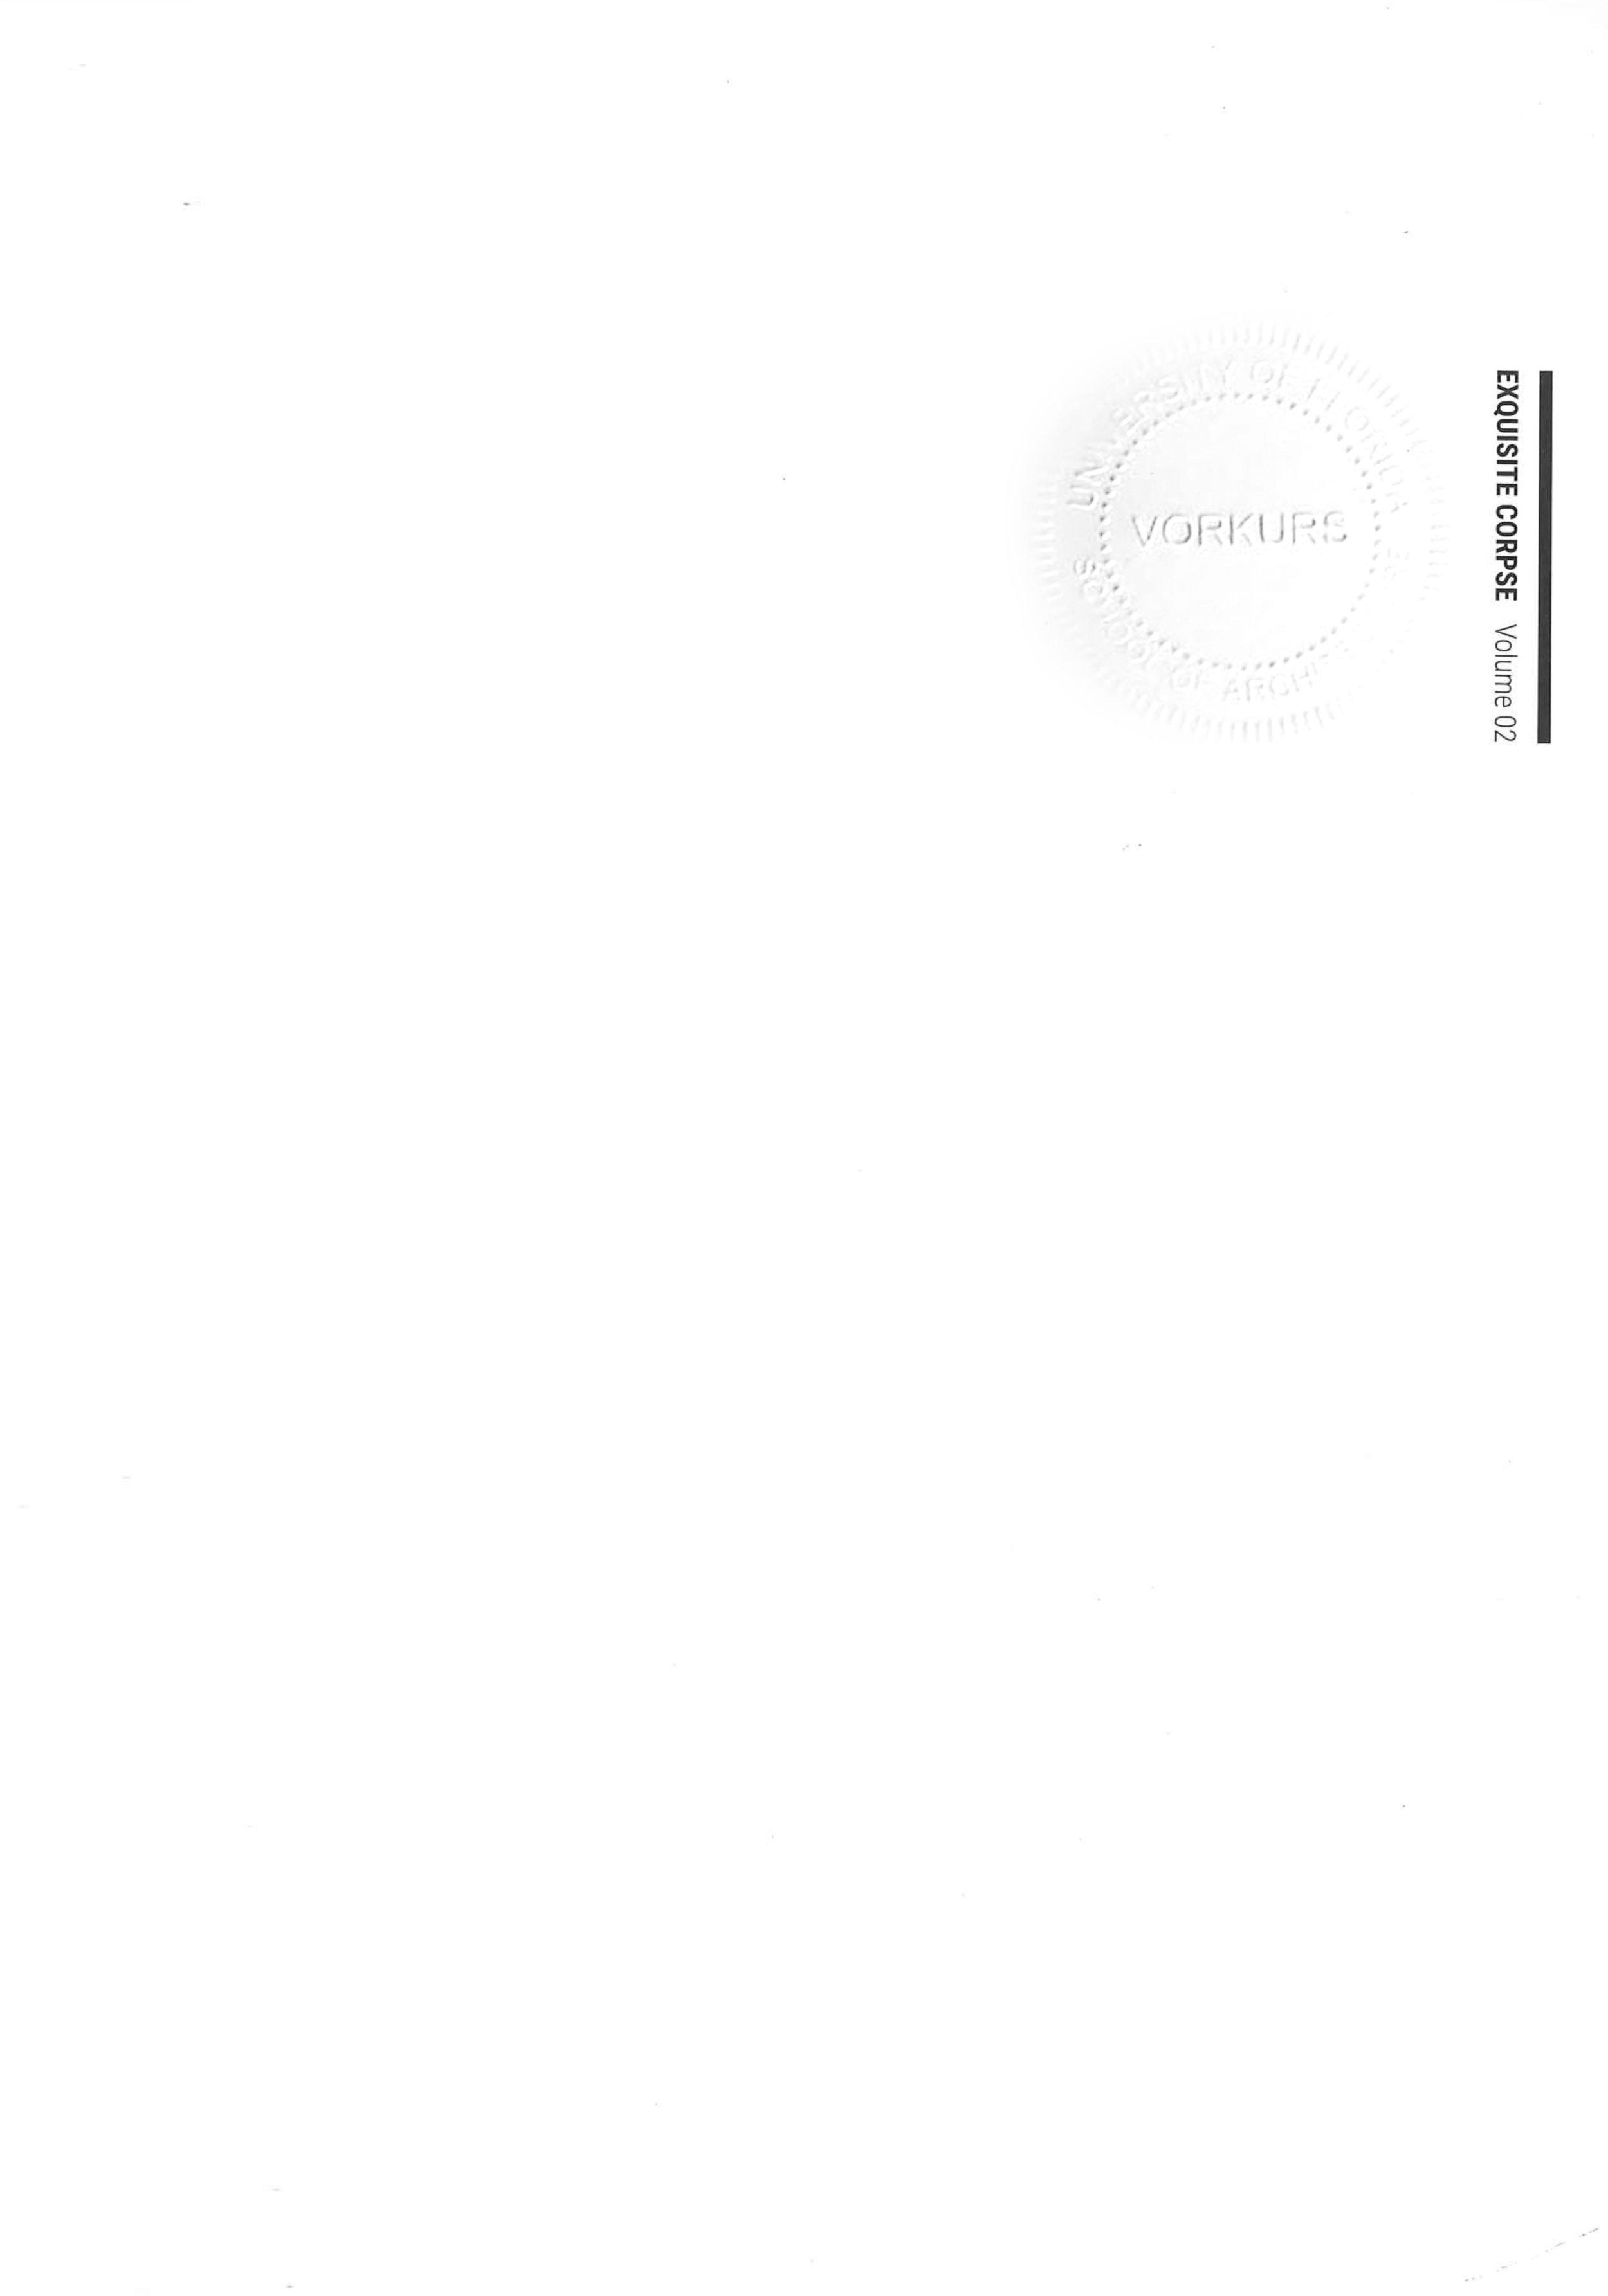 Vorkurs_Exquisite Corpse_Volume 02, University of Florida GSOA, 2018_page 01.jpg